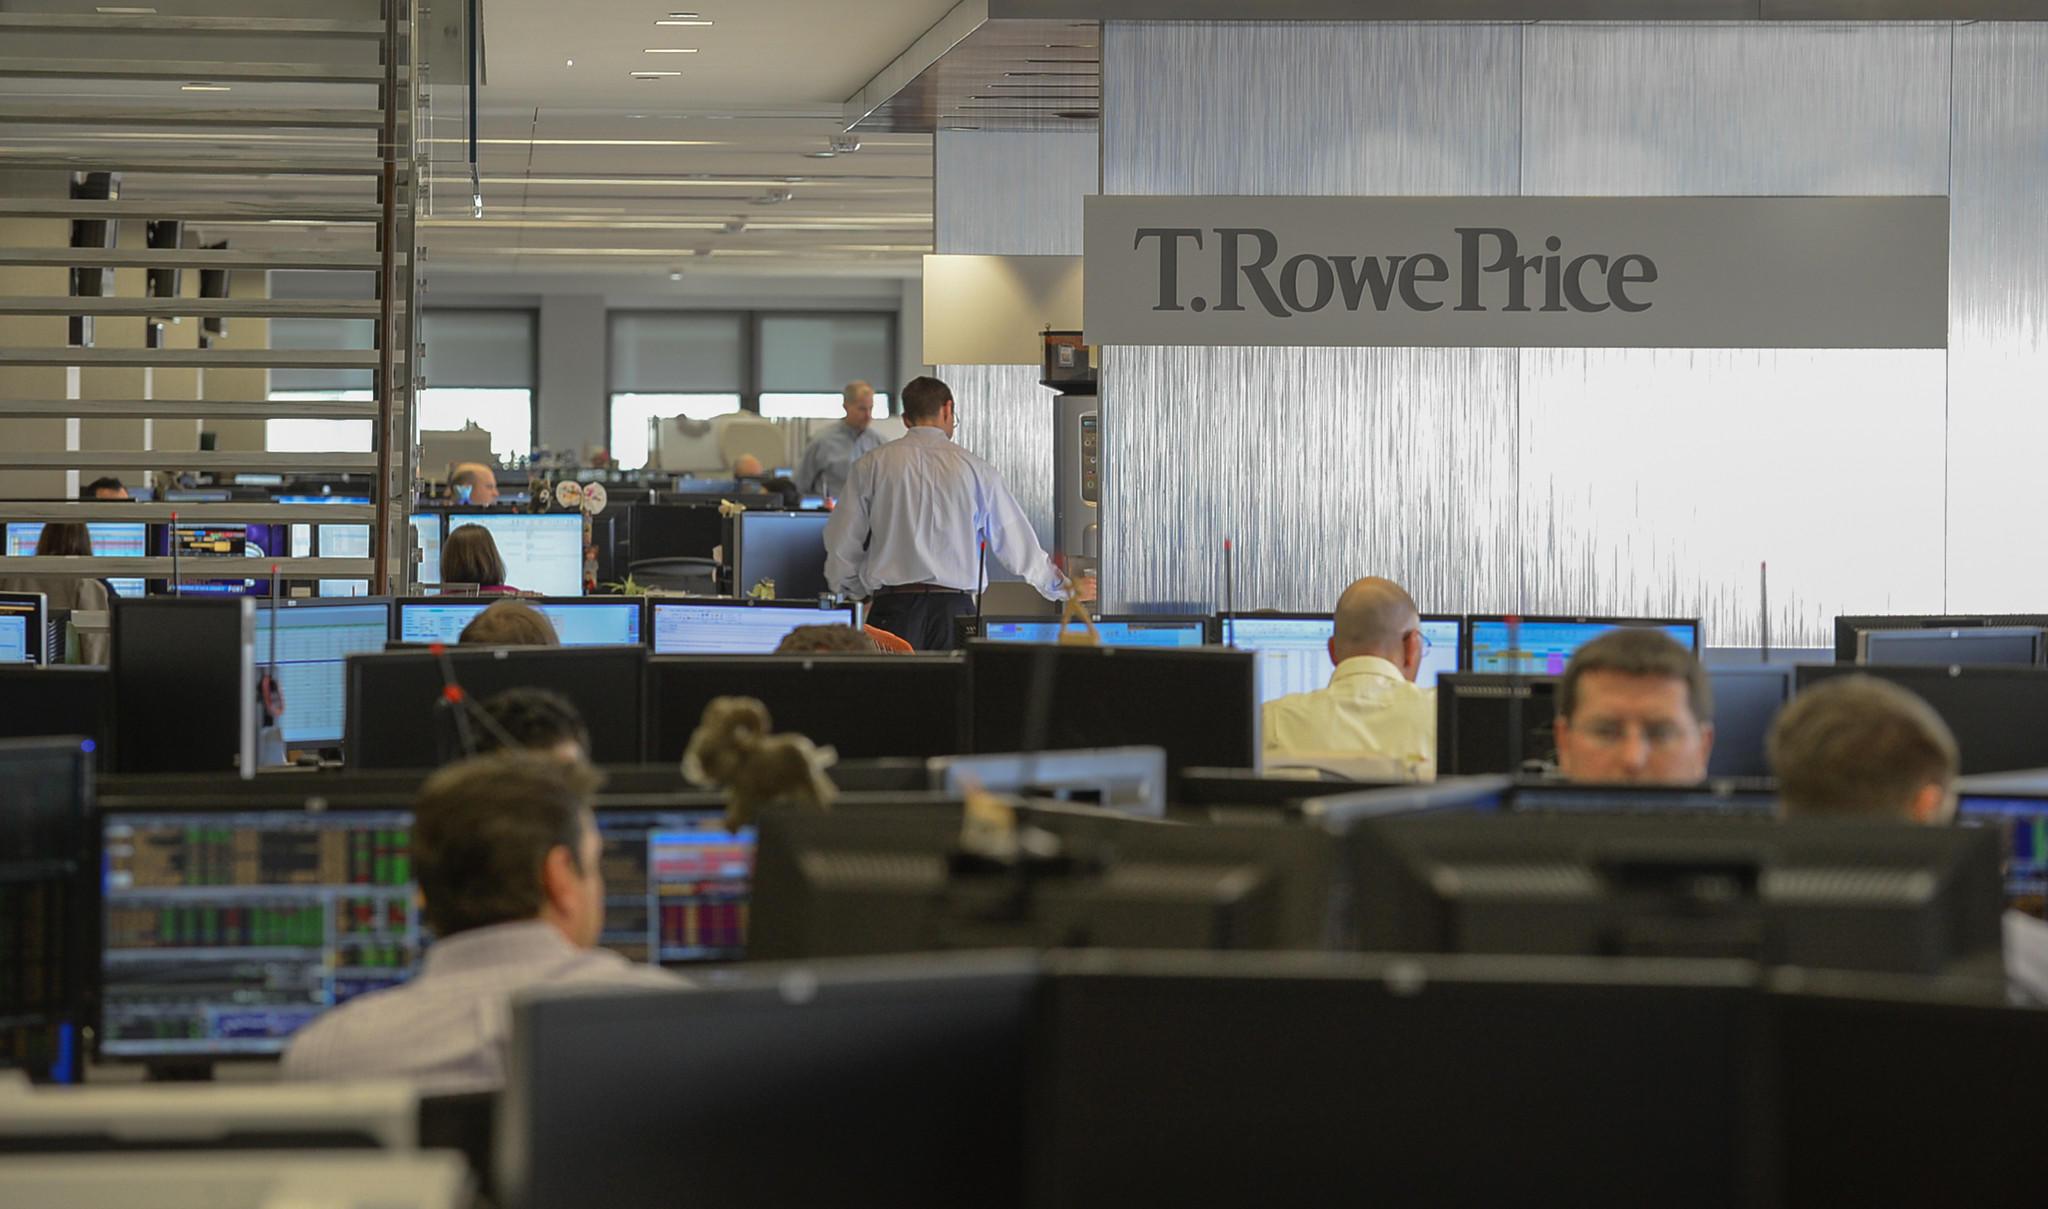 t rowe price closes two popular funds to new investors tribunedigital baltimoresun. Black Bedroom Furniture Sets. Home Design Ideas